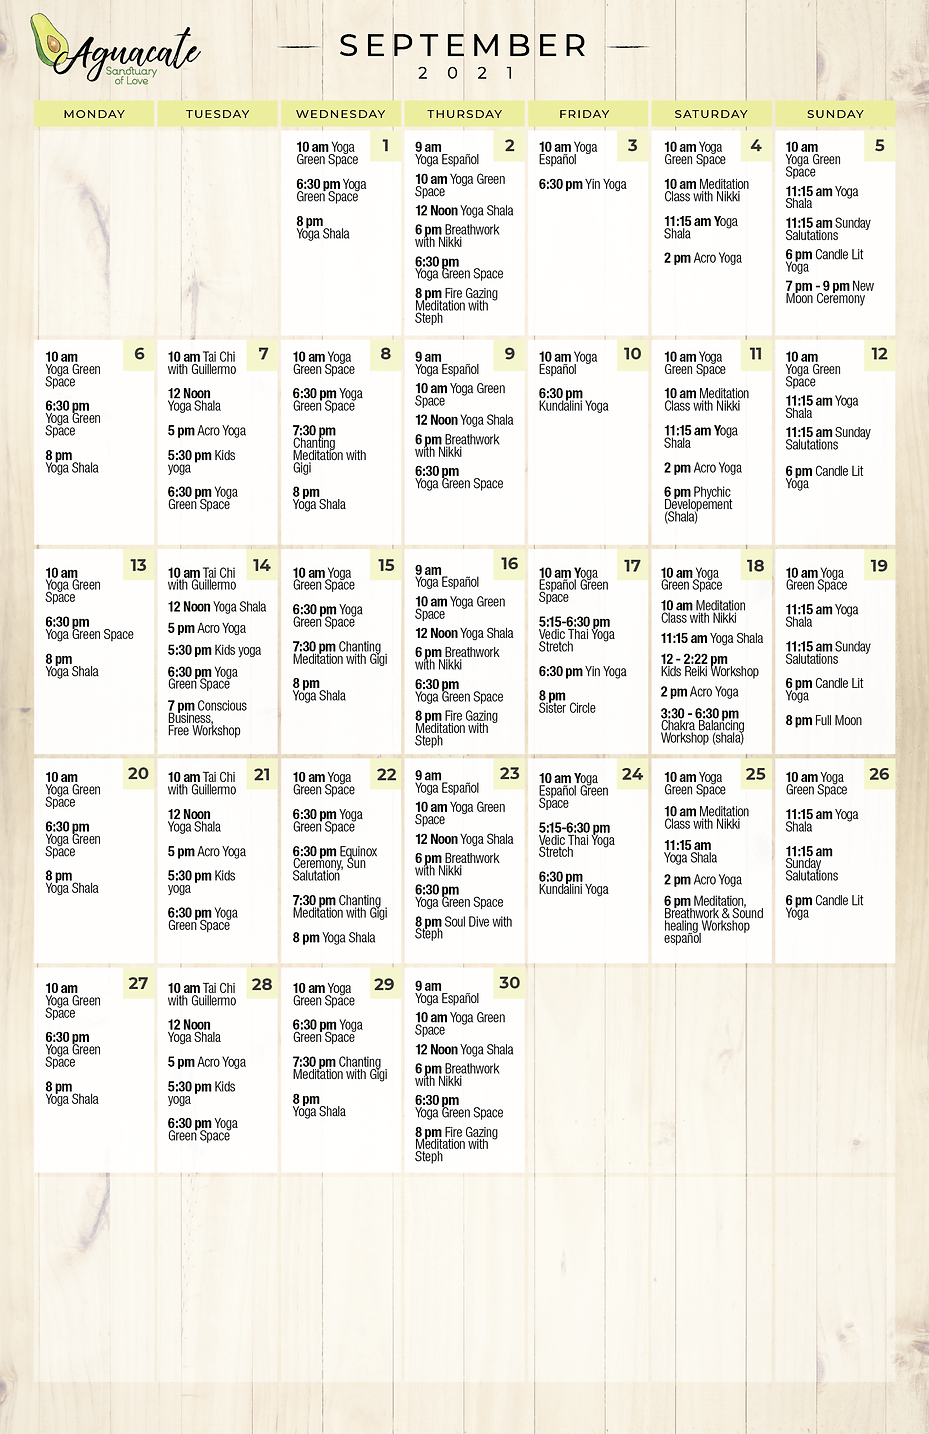 Aguacate calendar - SEPTEMBER 2021_back.png